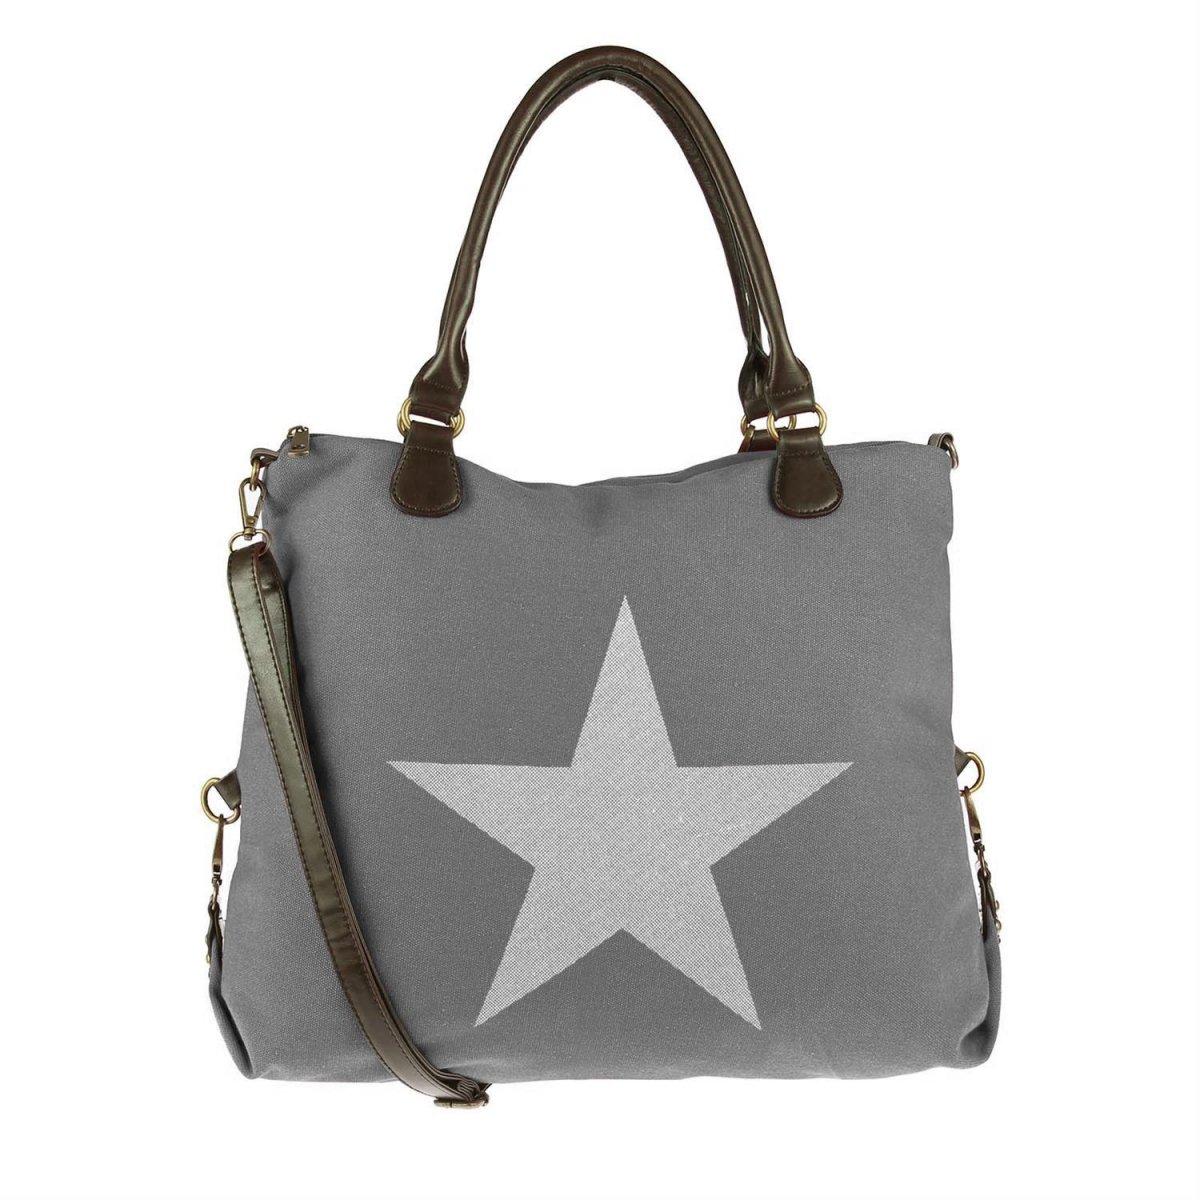 damen xxl stern shopper tasche handtasche damentasche. Black Bedroom Furniture Sets. Home Design Ideas